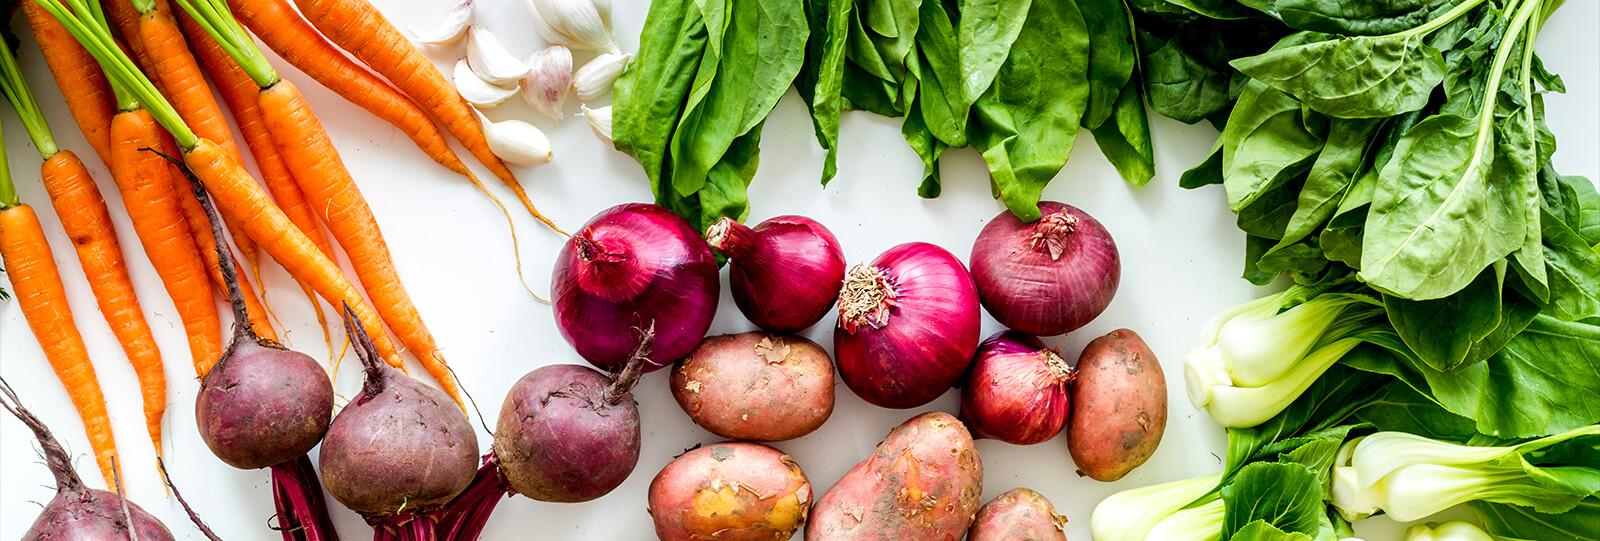 PFAS-fall-garden-veggies-carrots-beets-spinach-header